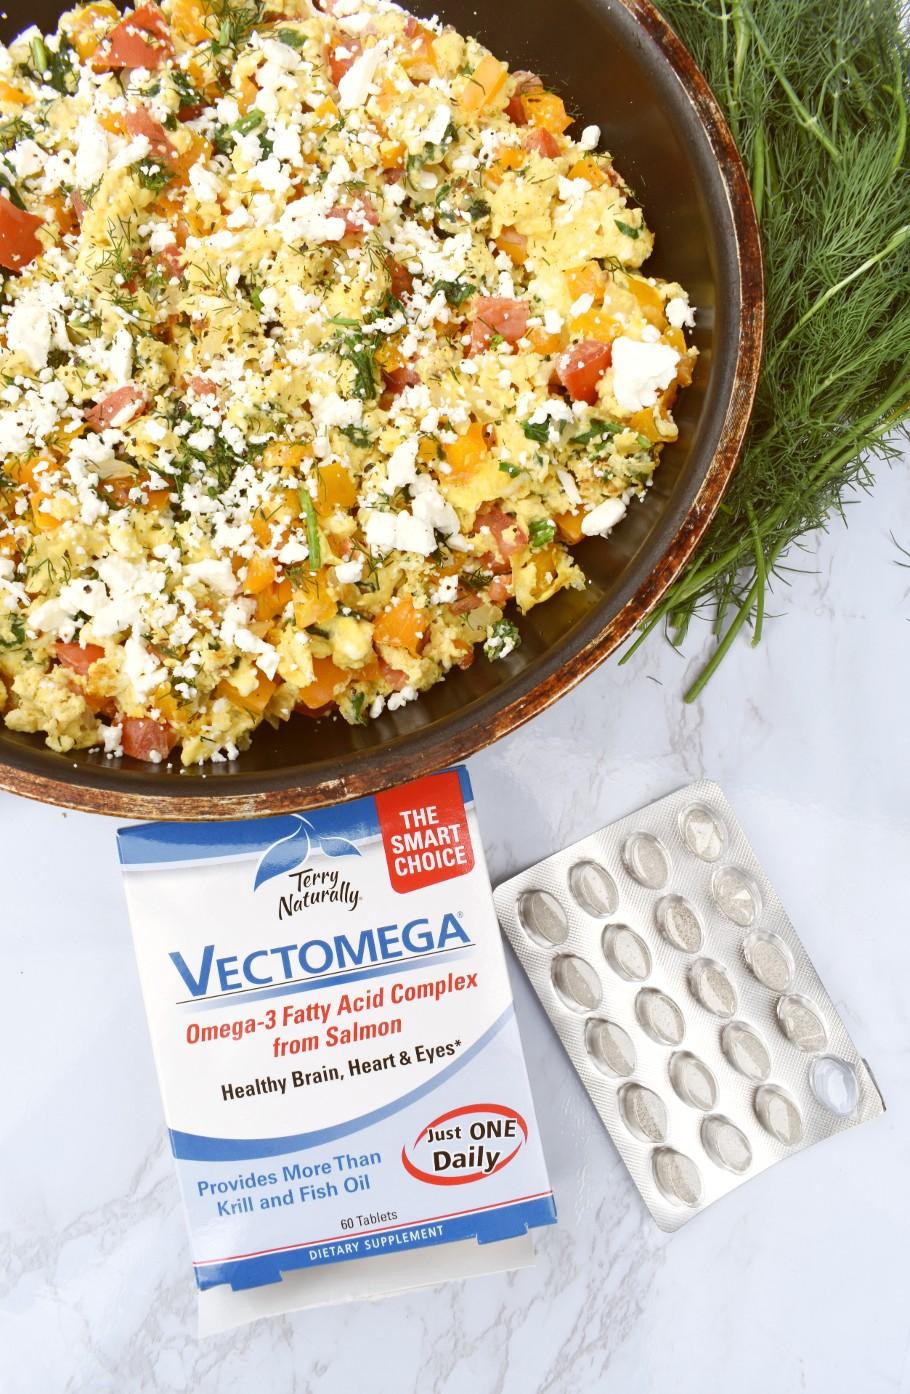 Vectomega omega 3 supplement